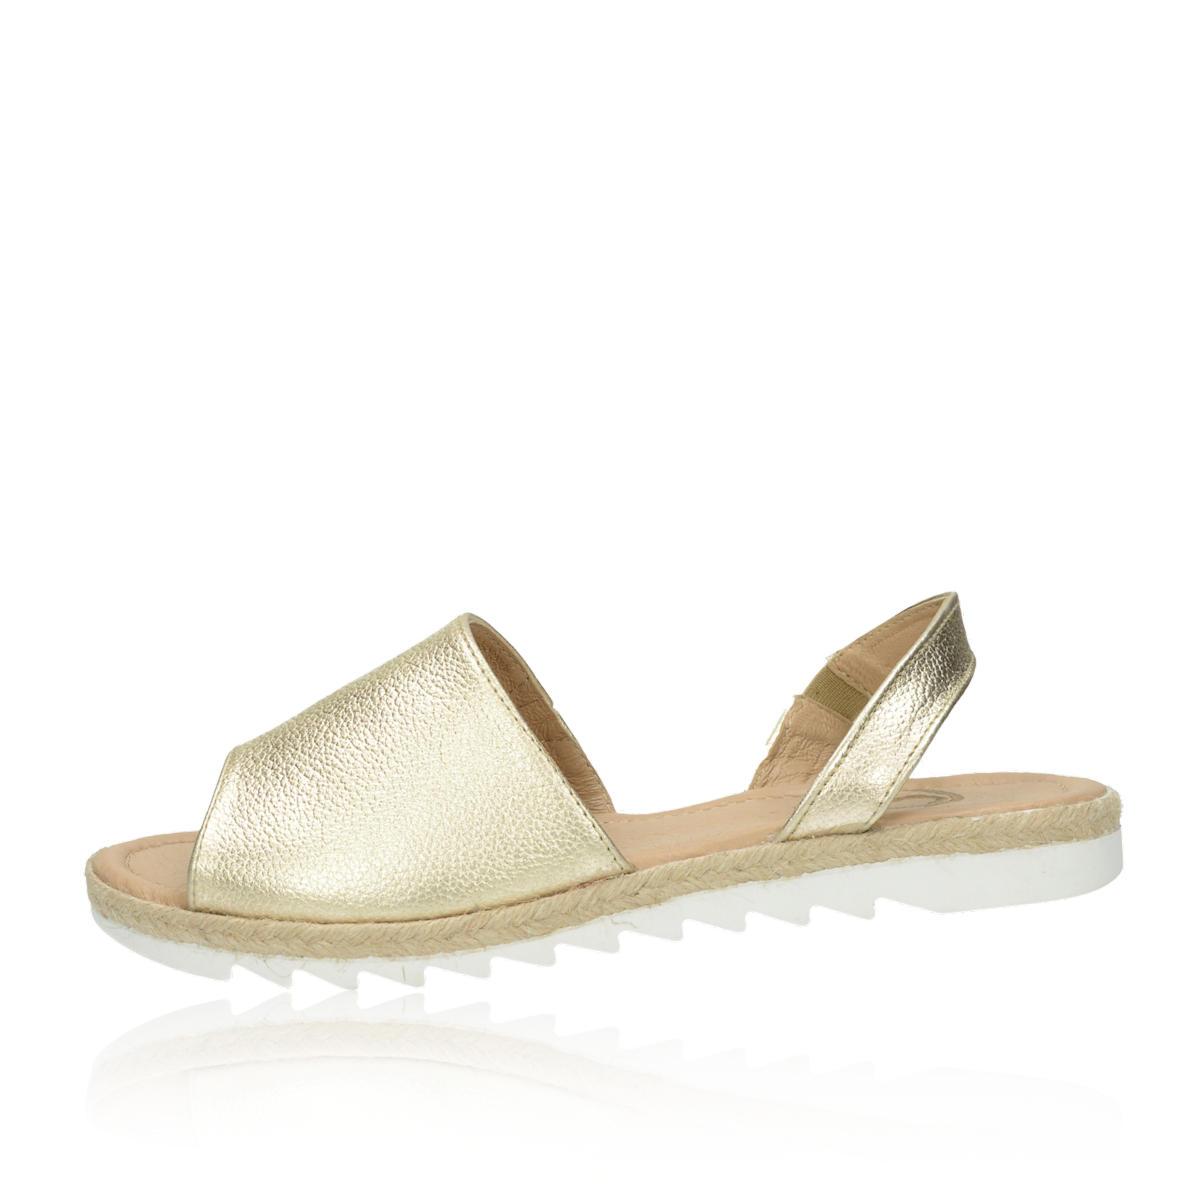 3b7cd97b7ffd ... Olivia shoes dámske kožené sandále - zlaté ...